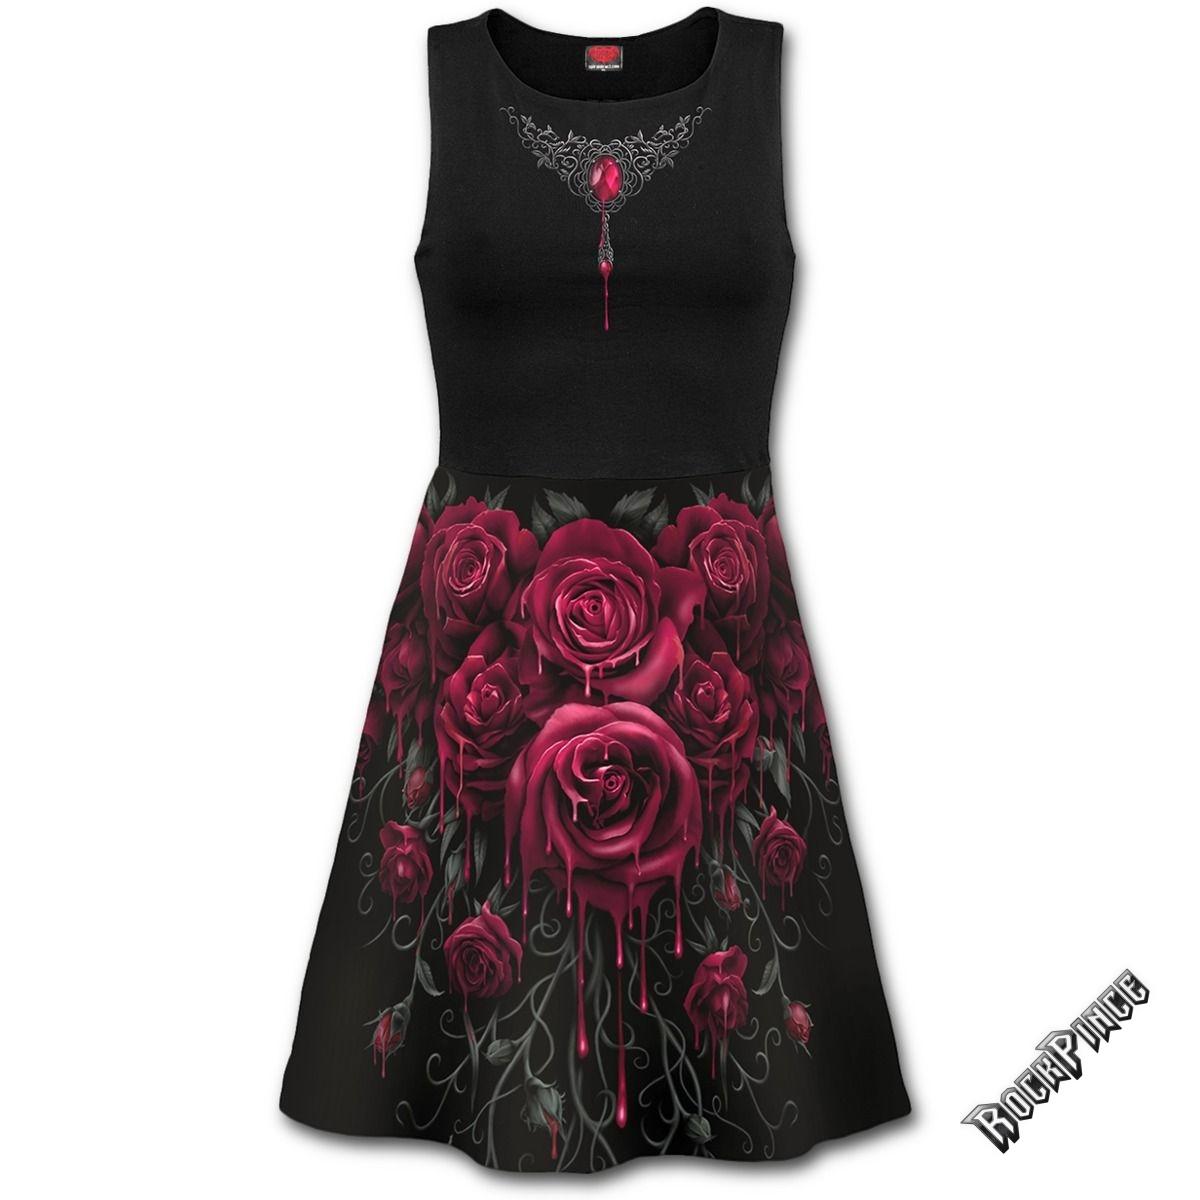 BLOOD ROSE AO - Mesh Layered Midi Skater Dress - S015F130